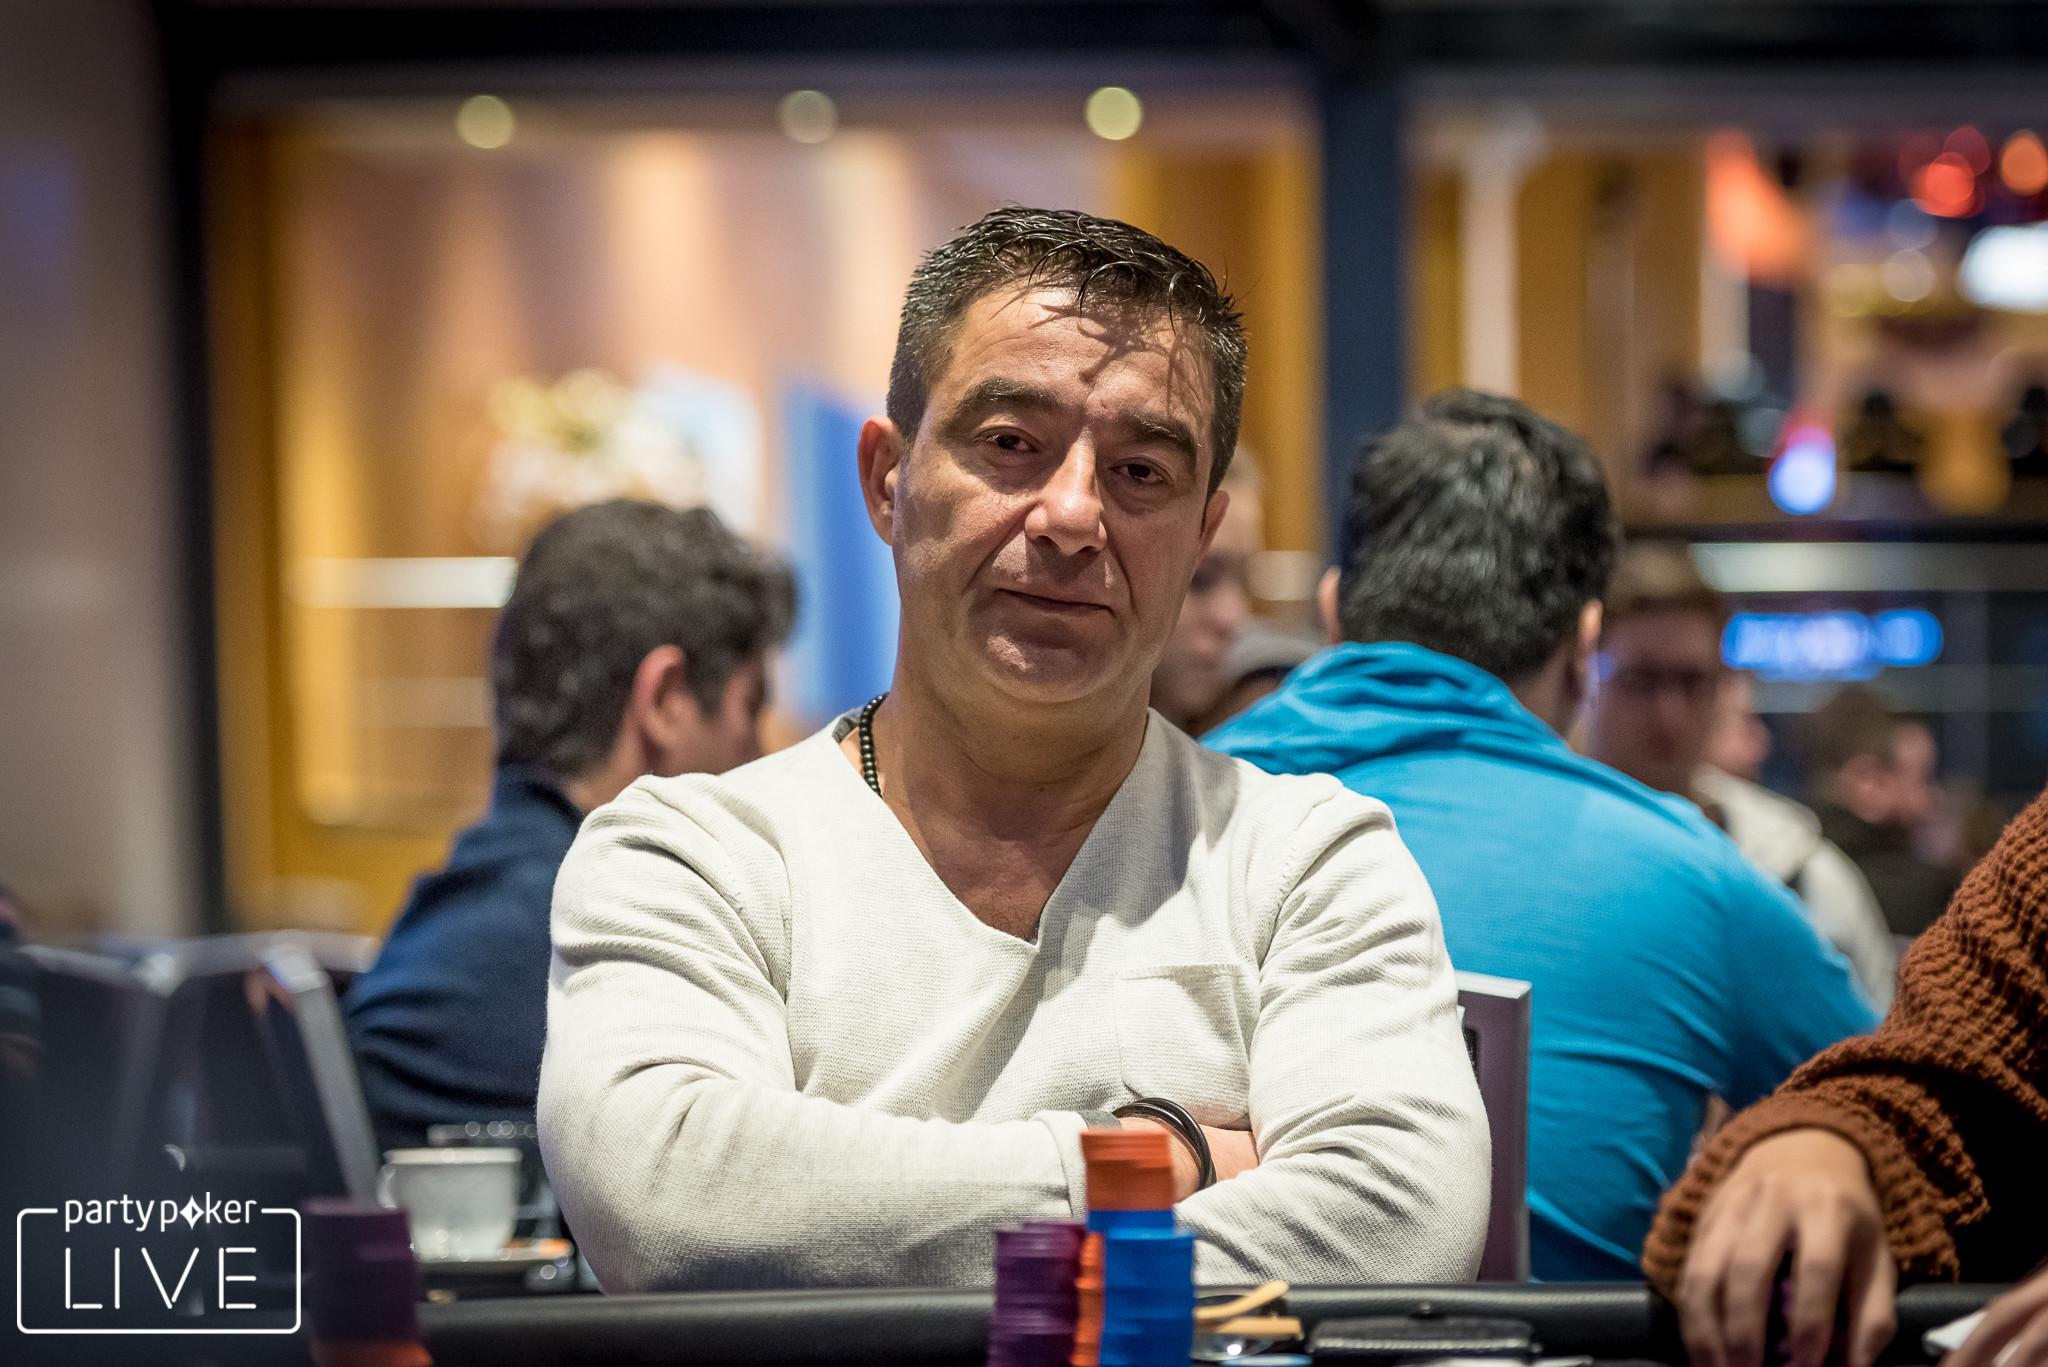 GALACTIC SERIES STARTS AUGUST 26 | Online poker